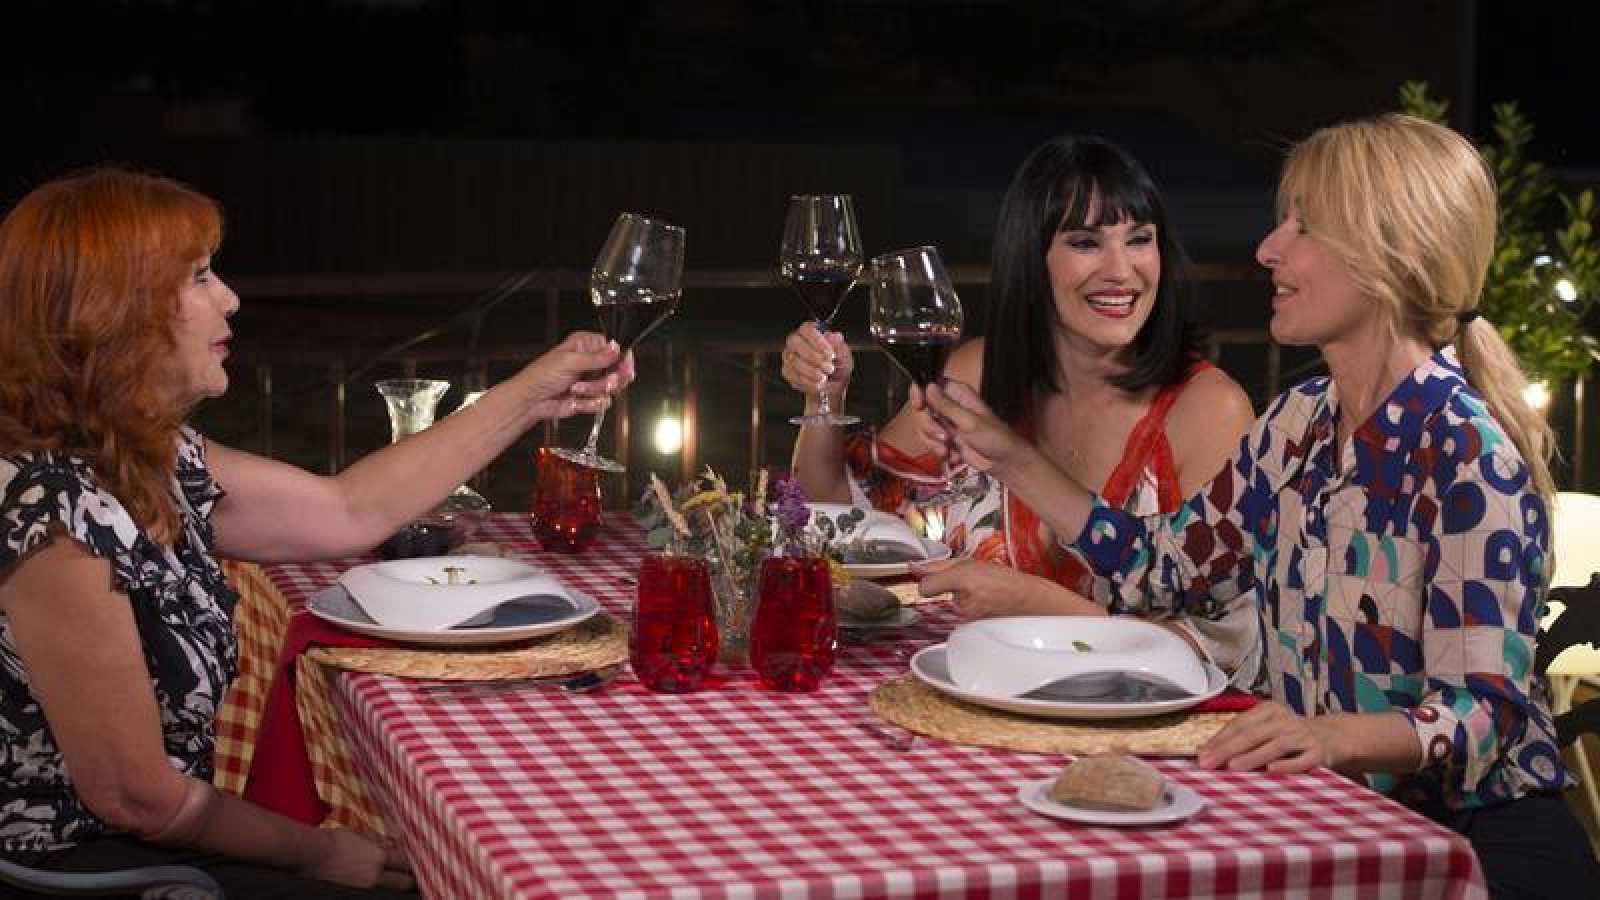 Cena con mamá homenajea a la madre de Irene Villa